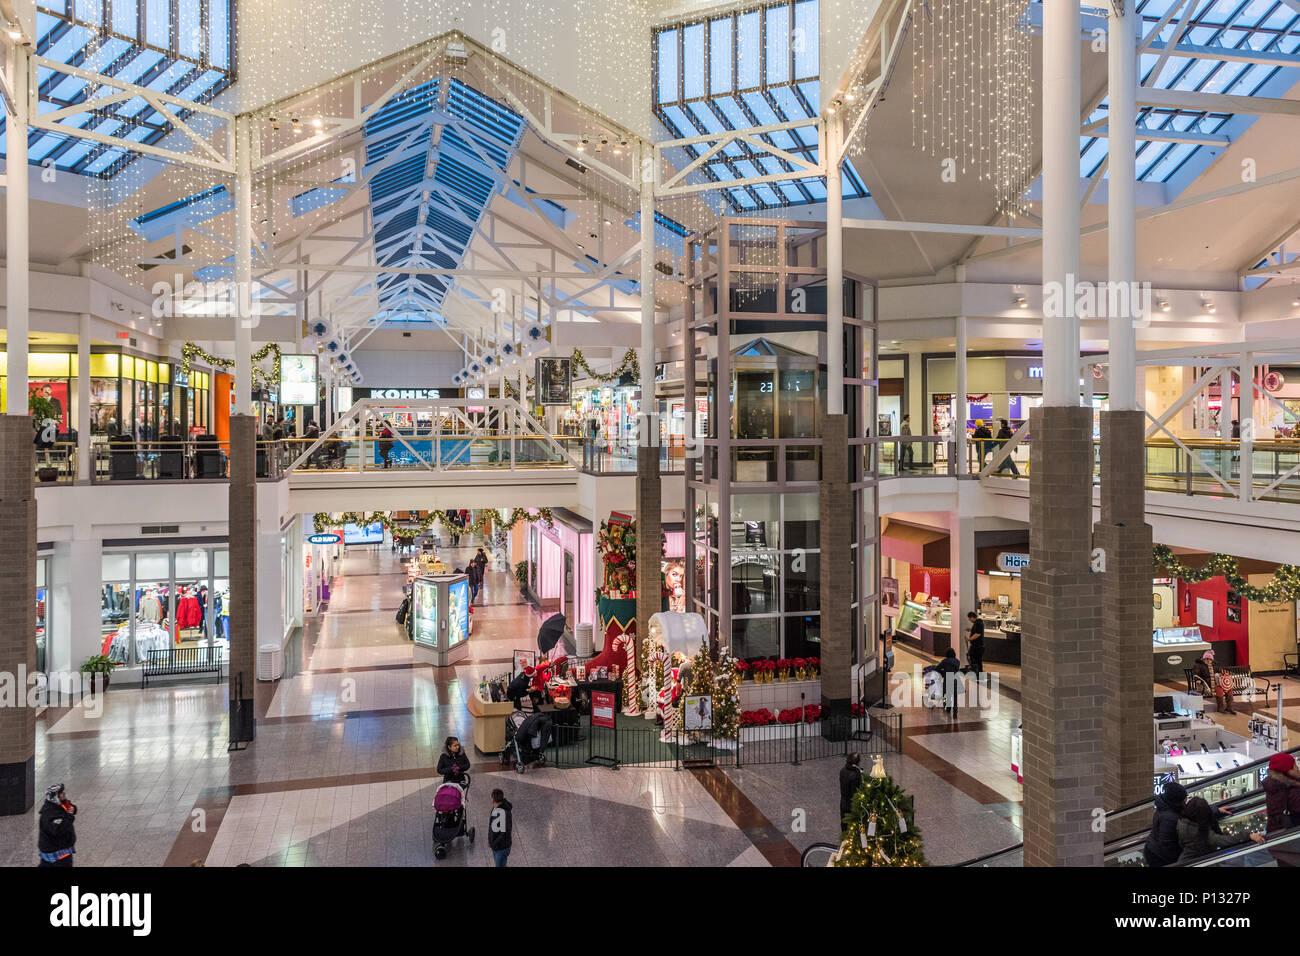 Interior of Woodfield Mall Stock Photo: 207206714 - Alamy